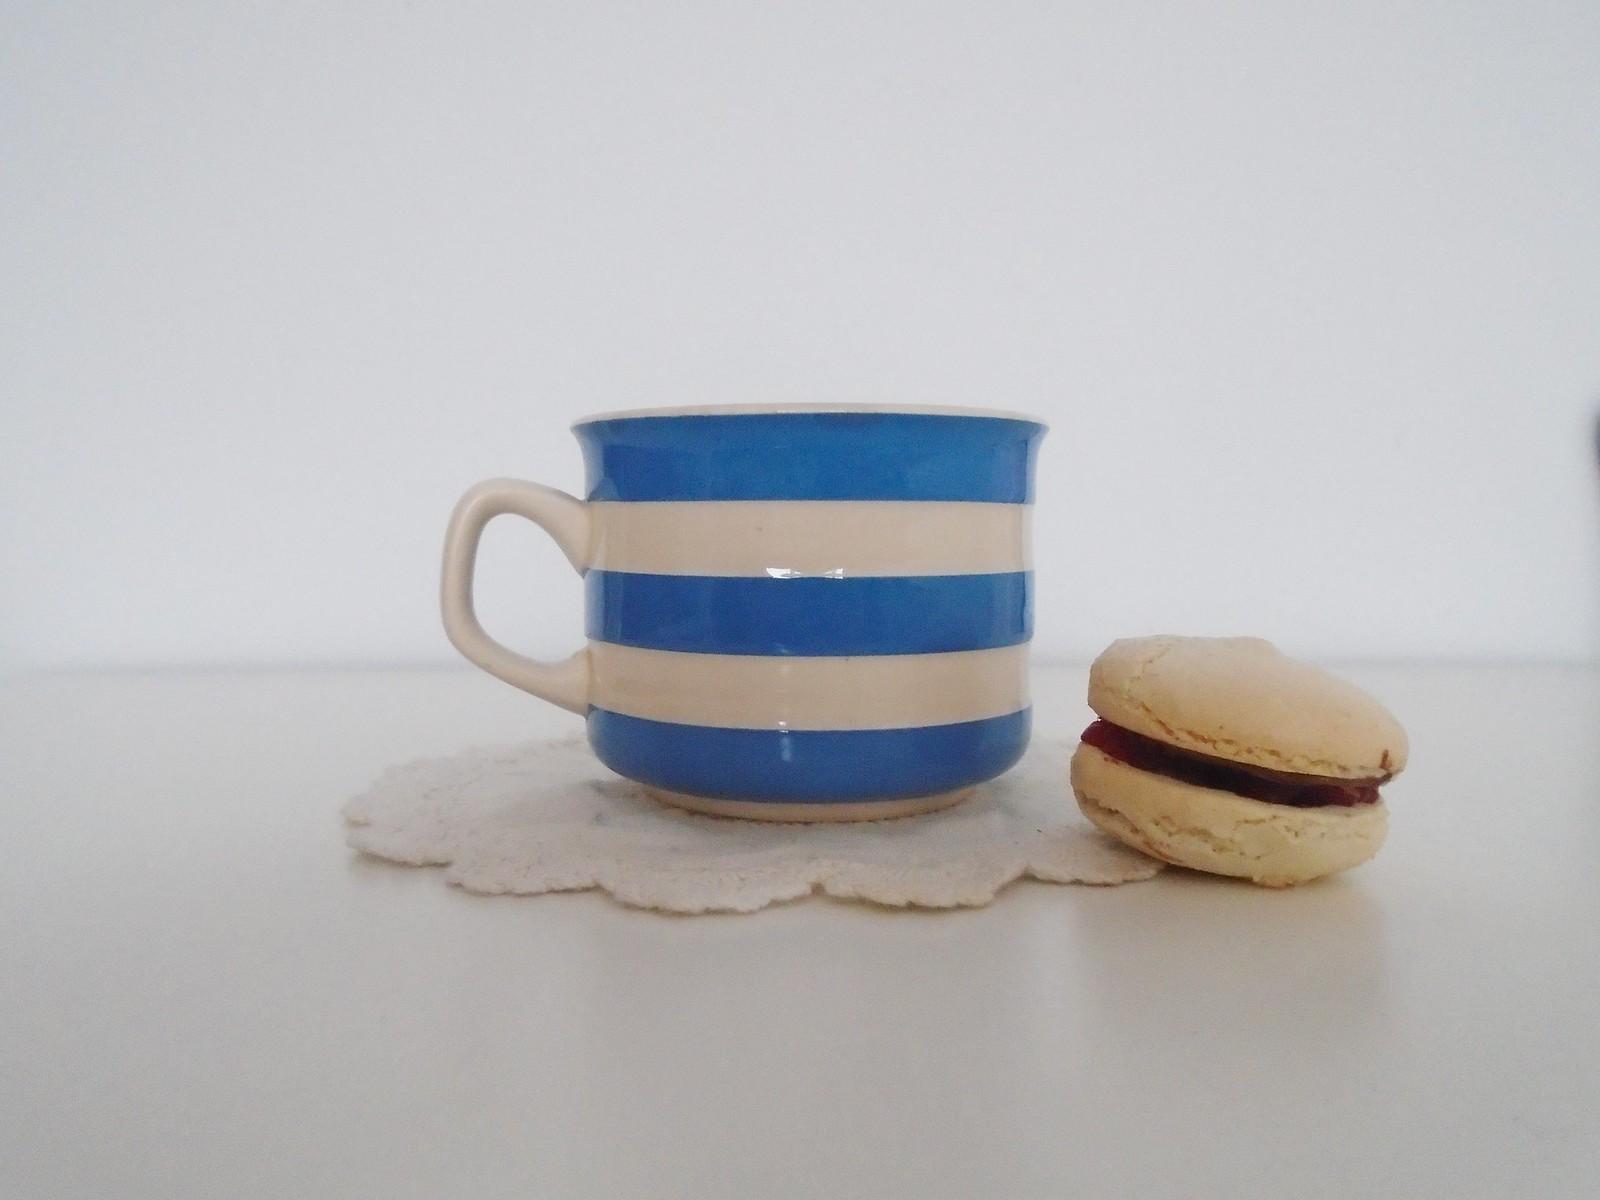 macaron and tea